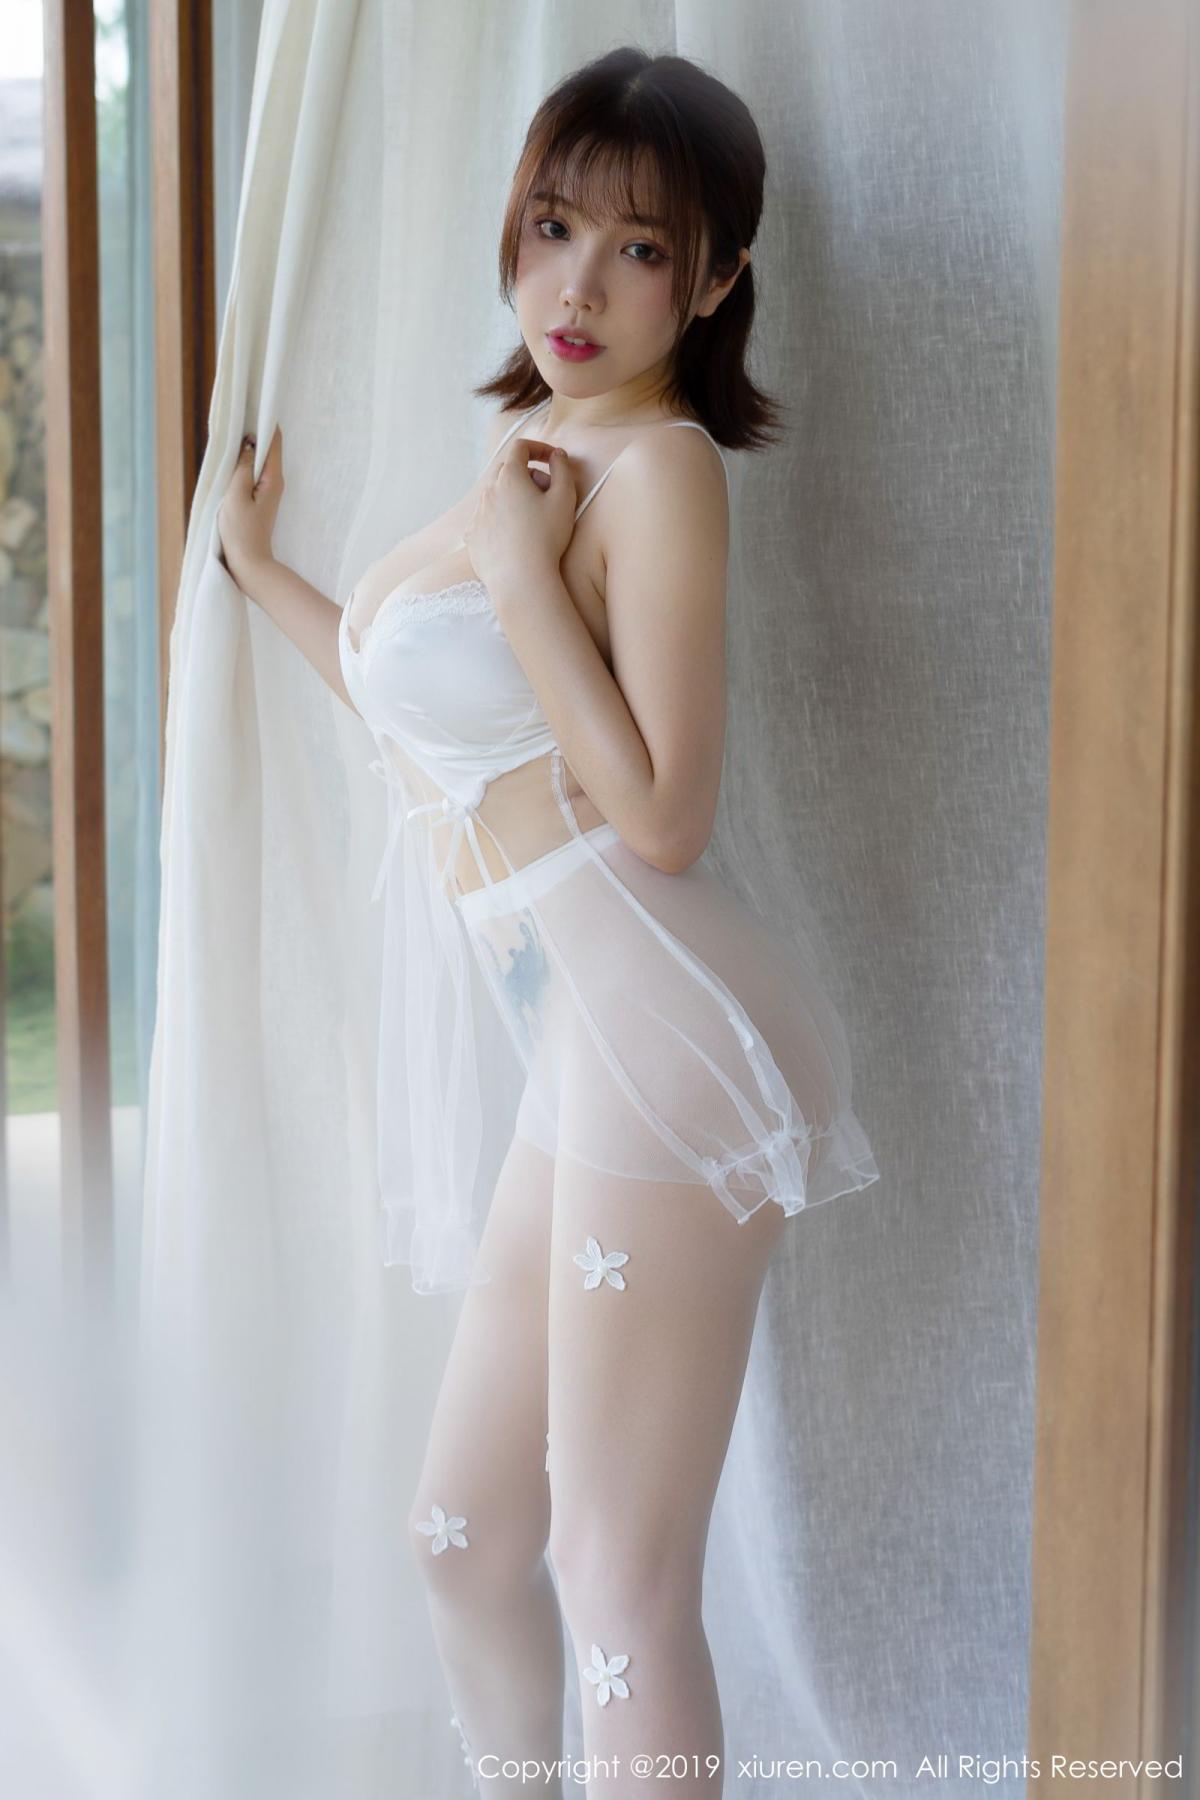 [XiuRen] Vol.1578 Huang Le Ran 4P, Huang Le Ran, Underwear, Xiuren